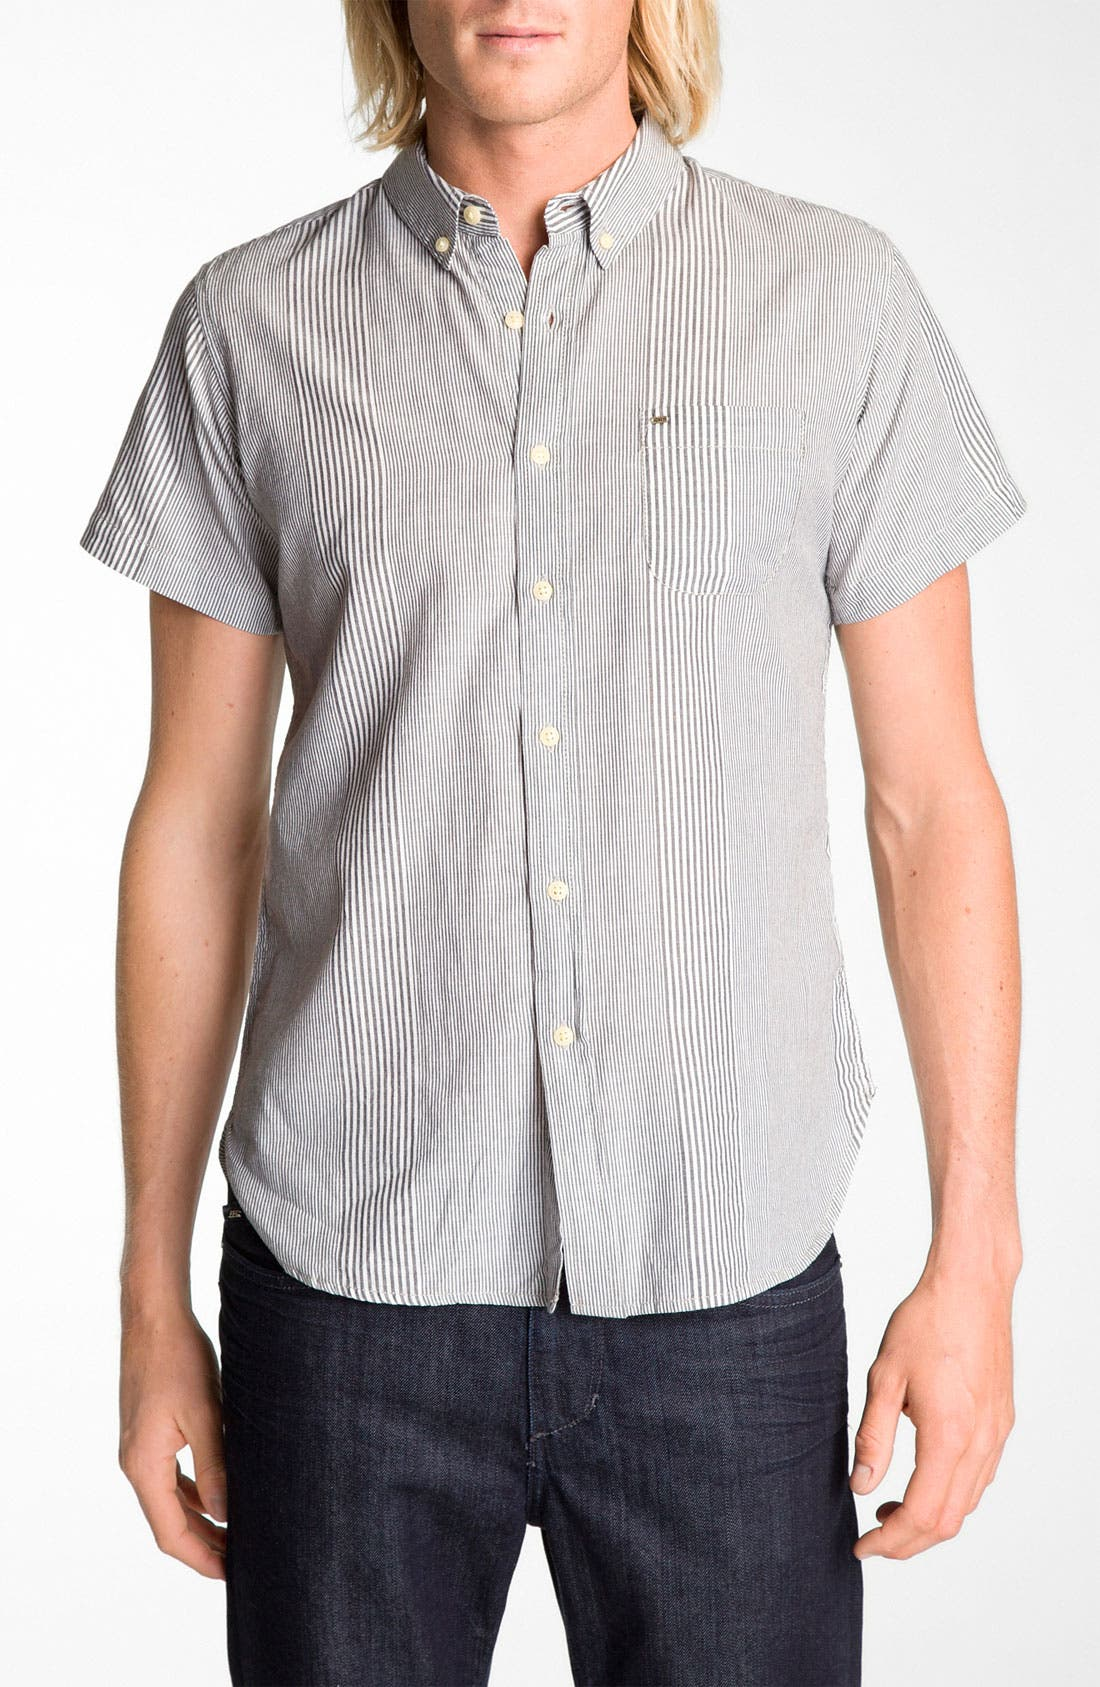 Alternate Image 1 Selected - Obey 'Wayne' Stripe Woven Shirt